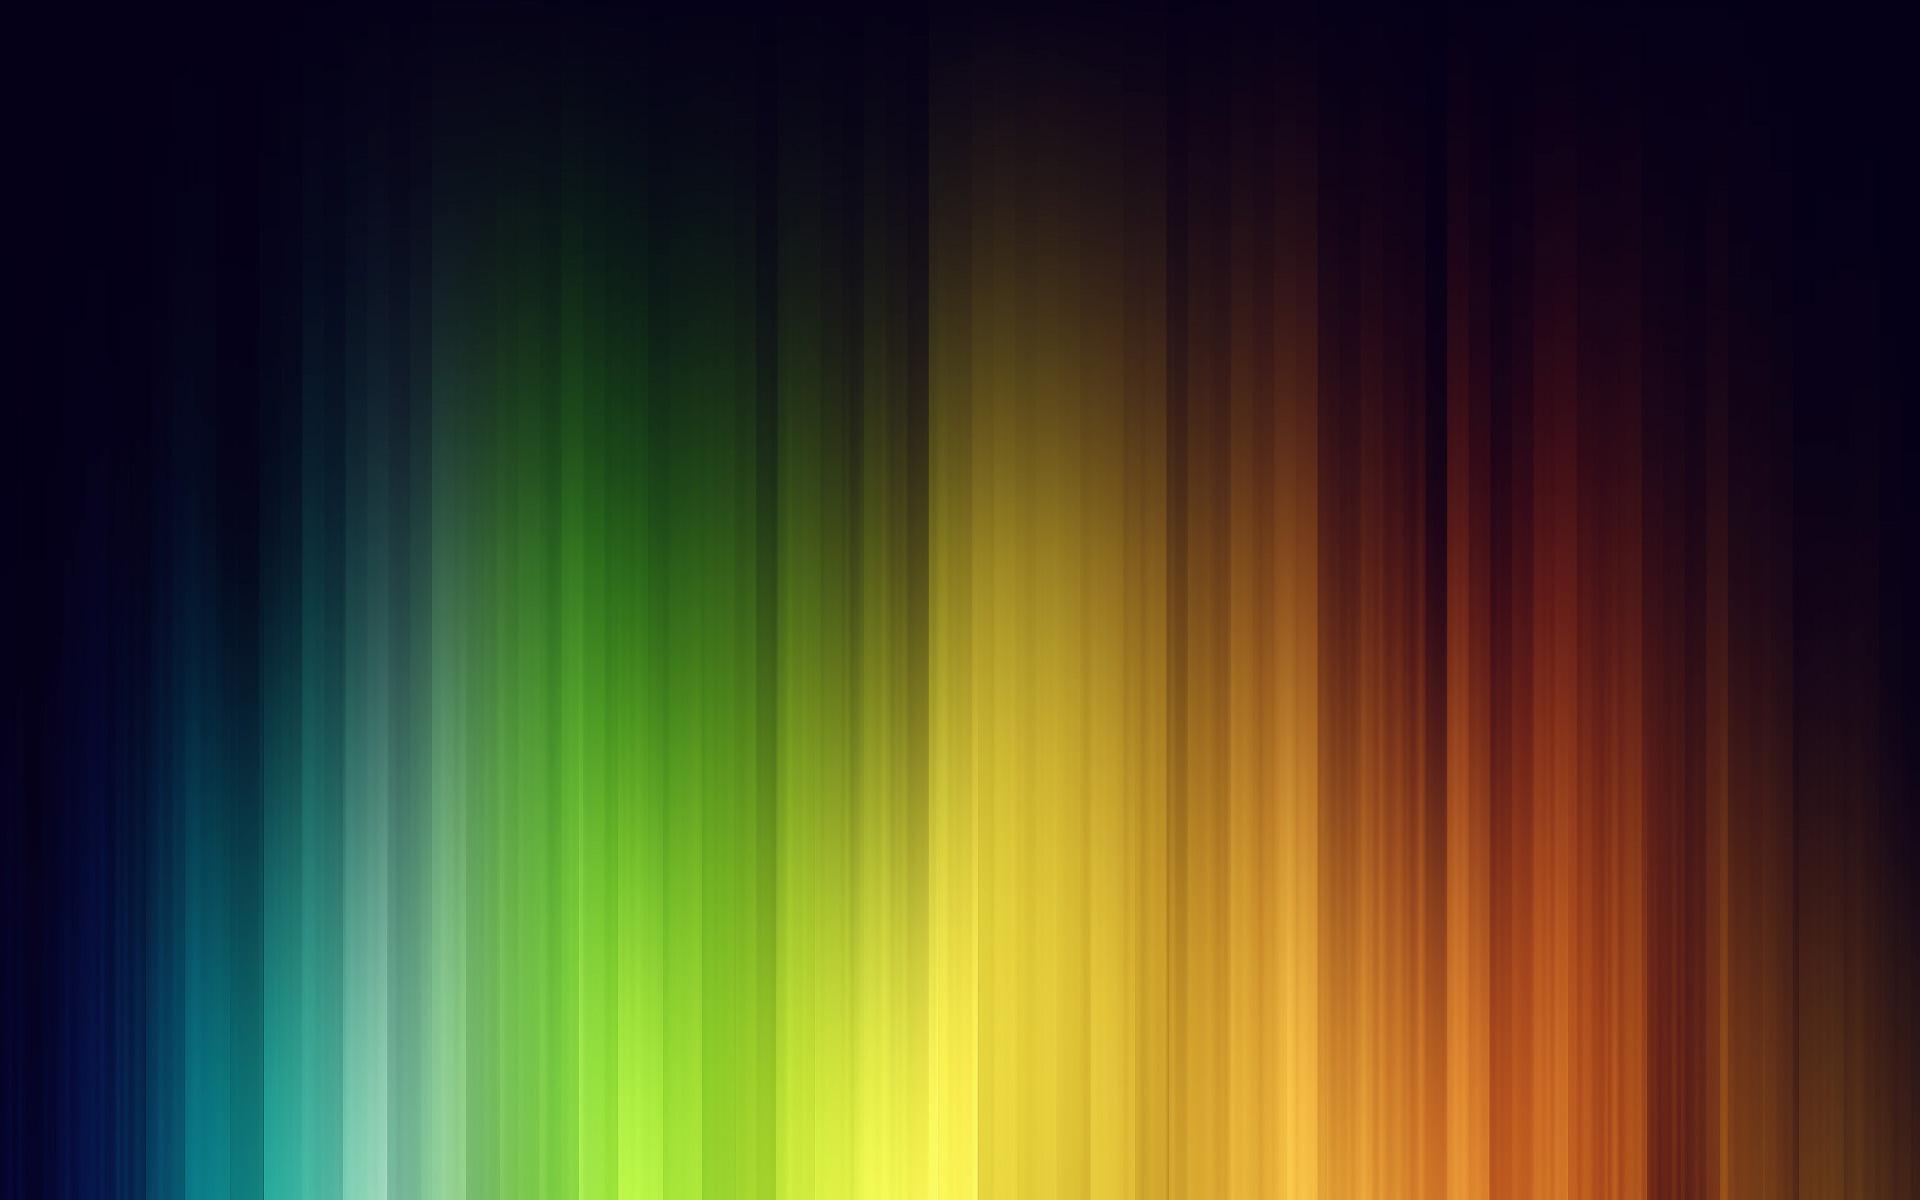 Digital Aurora Exclusive HD Wallpapers 5533 1920x1200